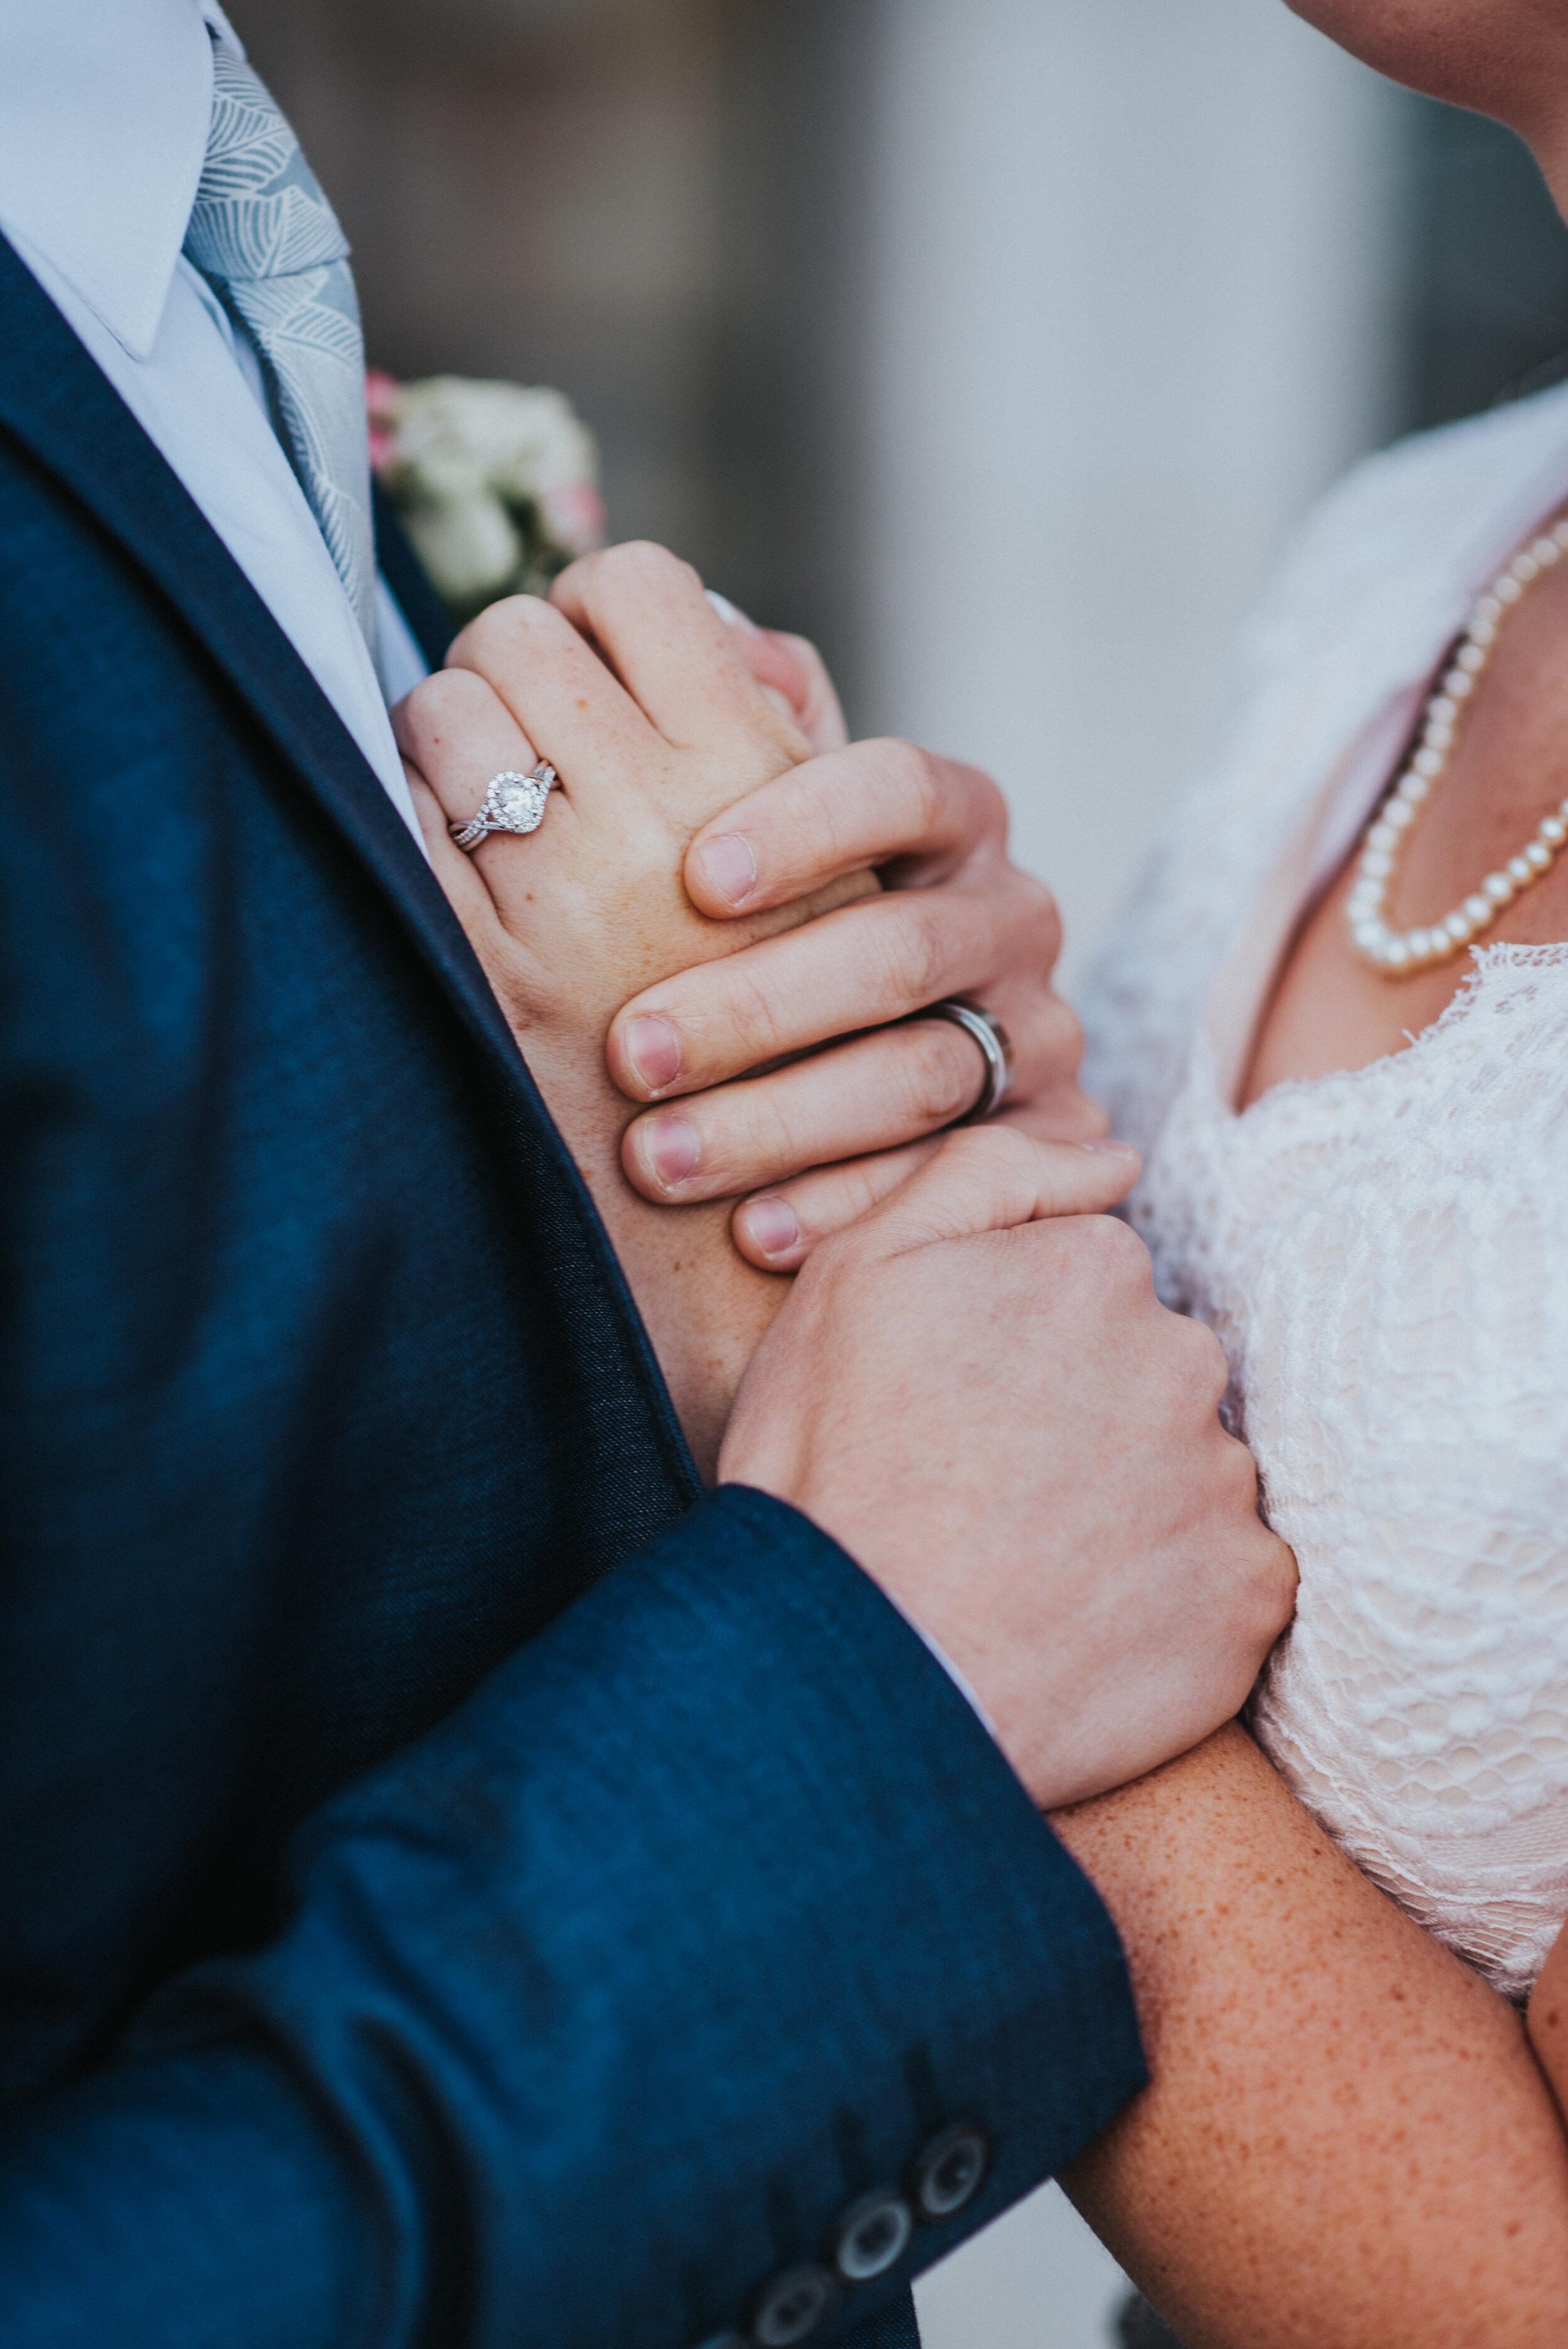 holding_hands_wedding_rings.jpeg